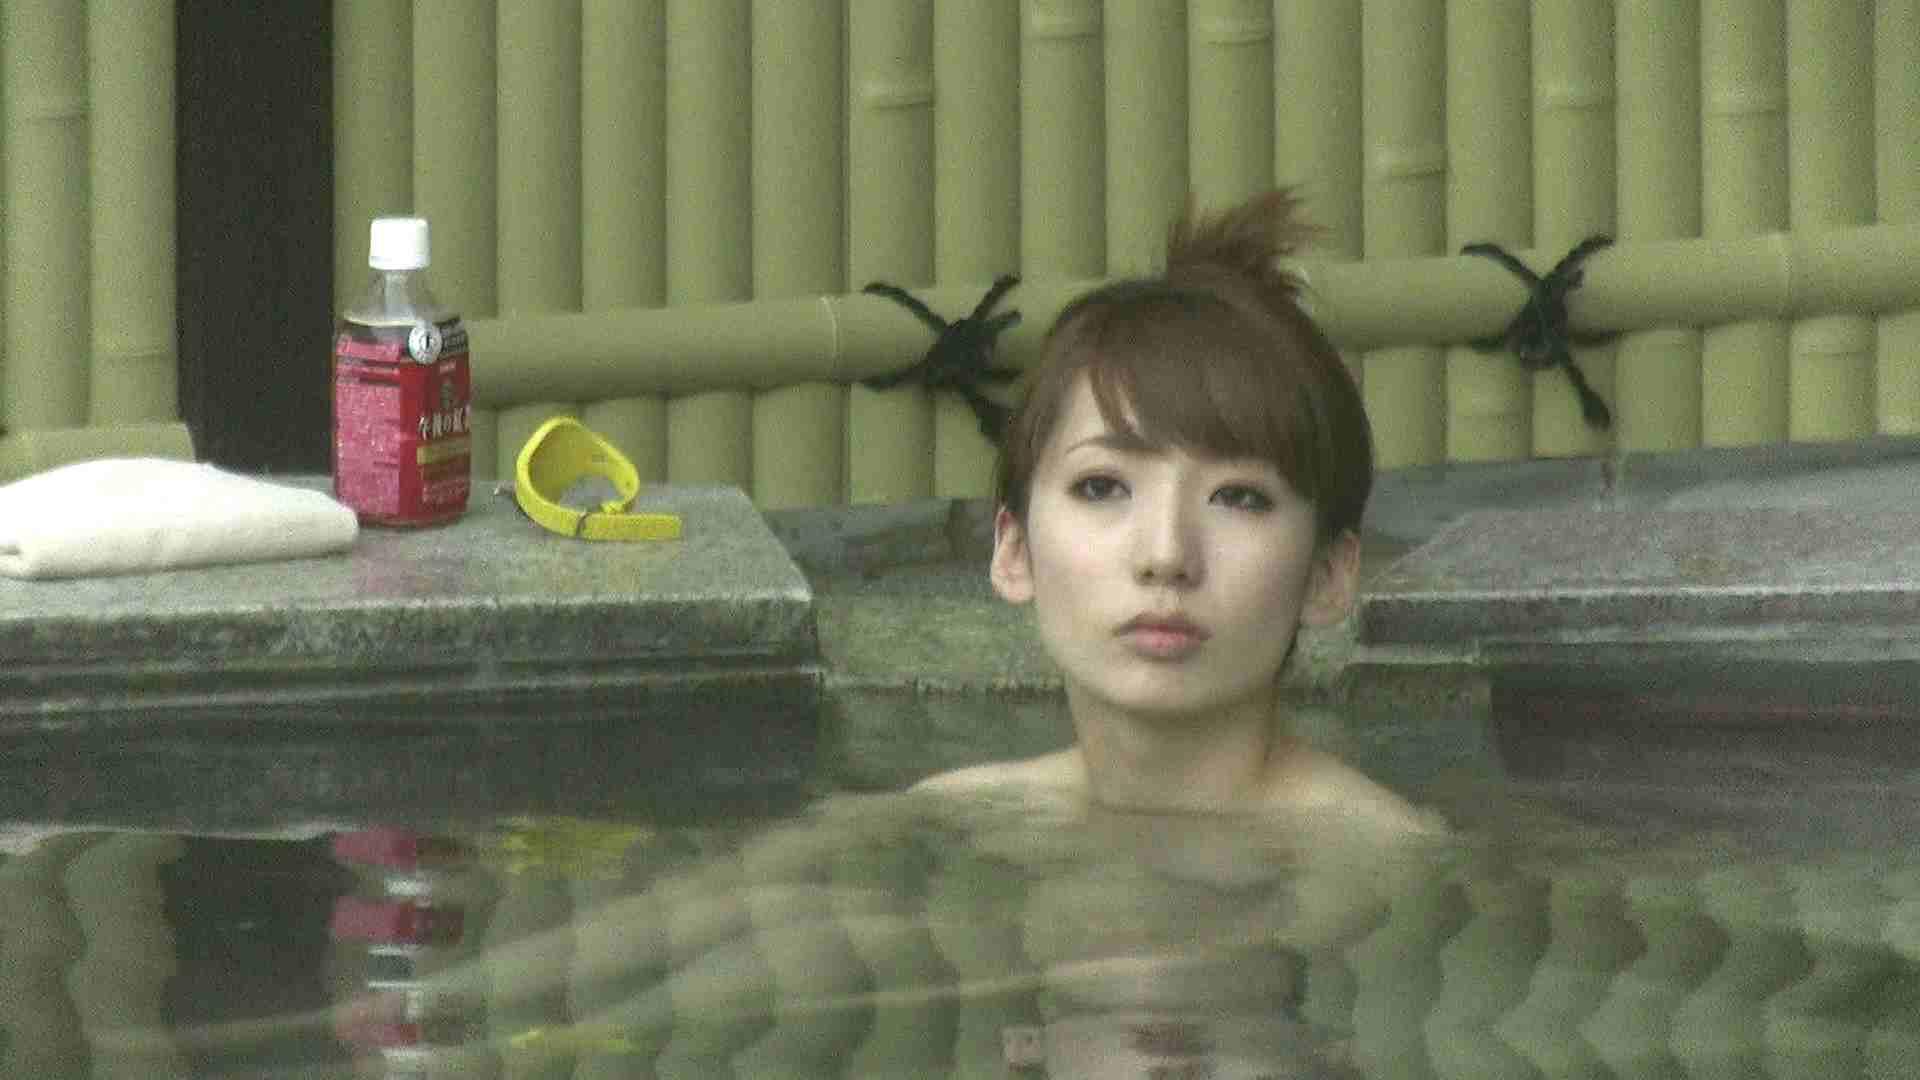 Aquaな露天風呂Vol.208 HなOL   盗撮  101pic 30